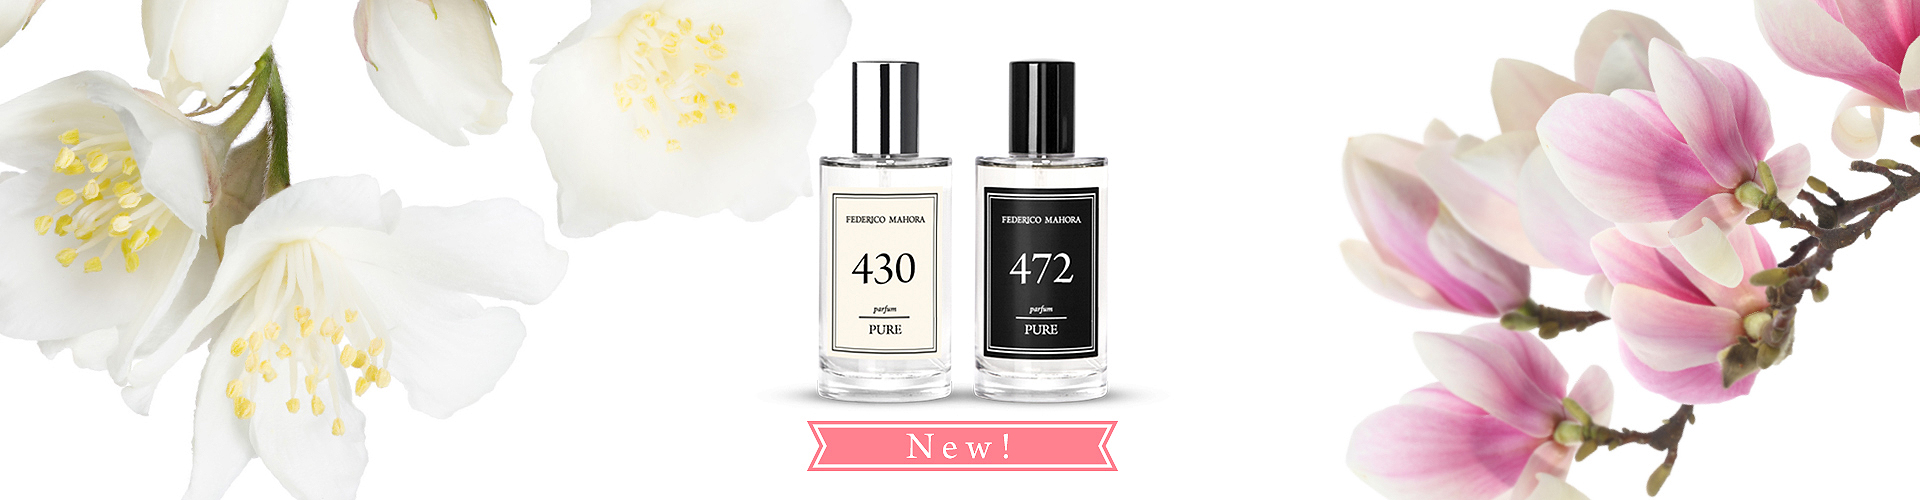 FM Parfum shop | Online FM Parfum en make-up bestellen banner 2